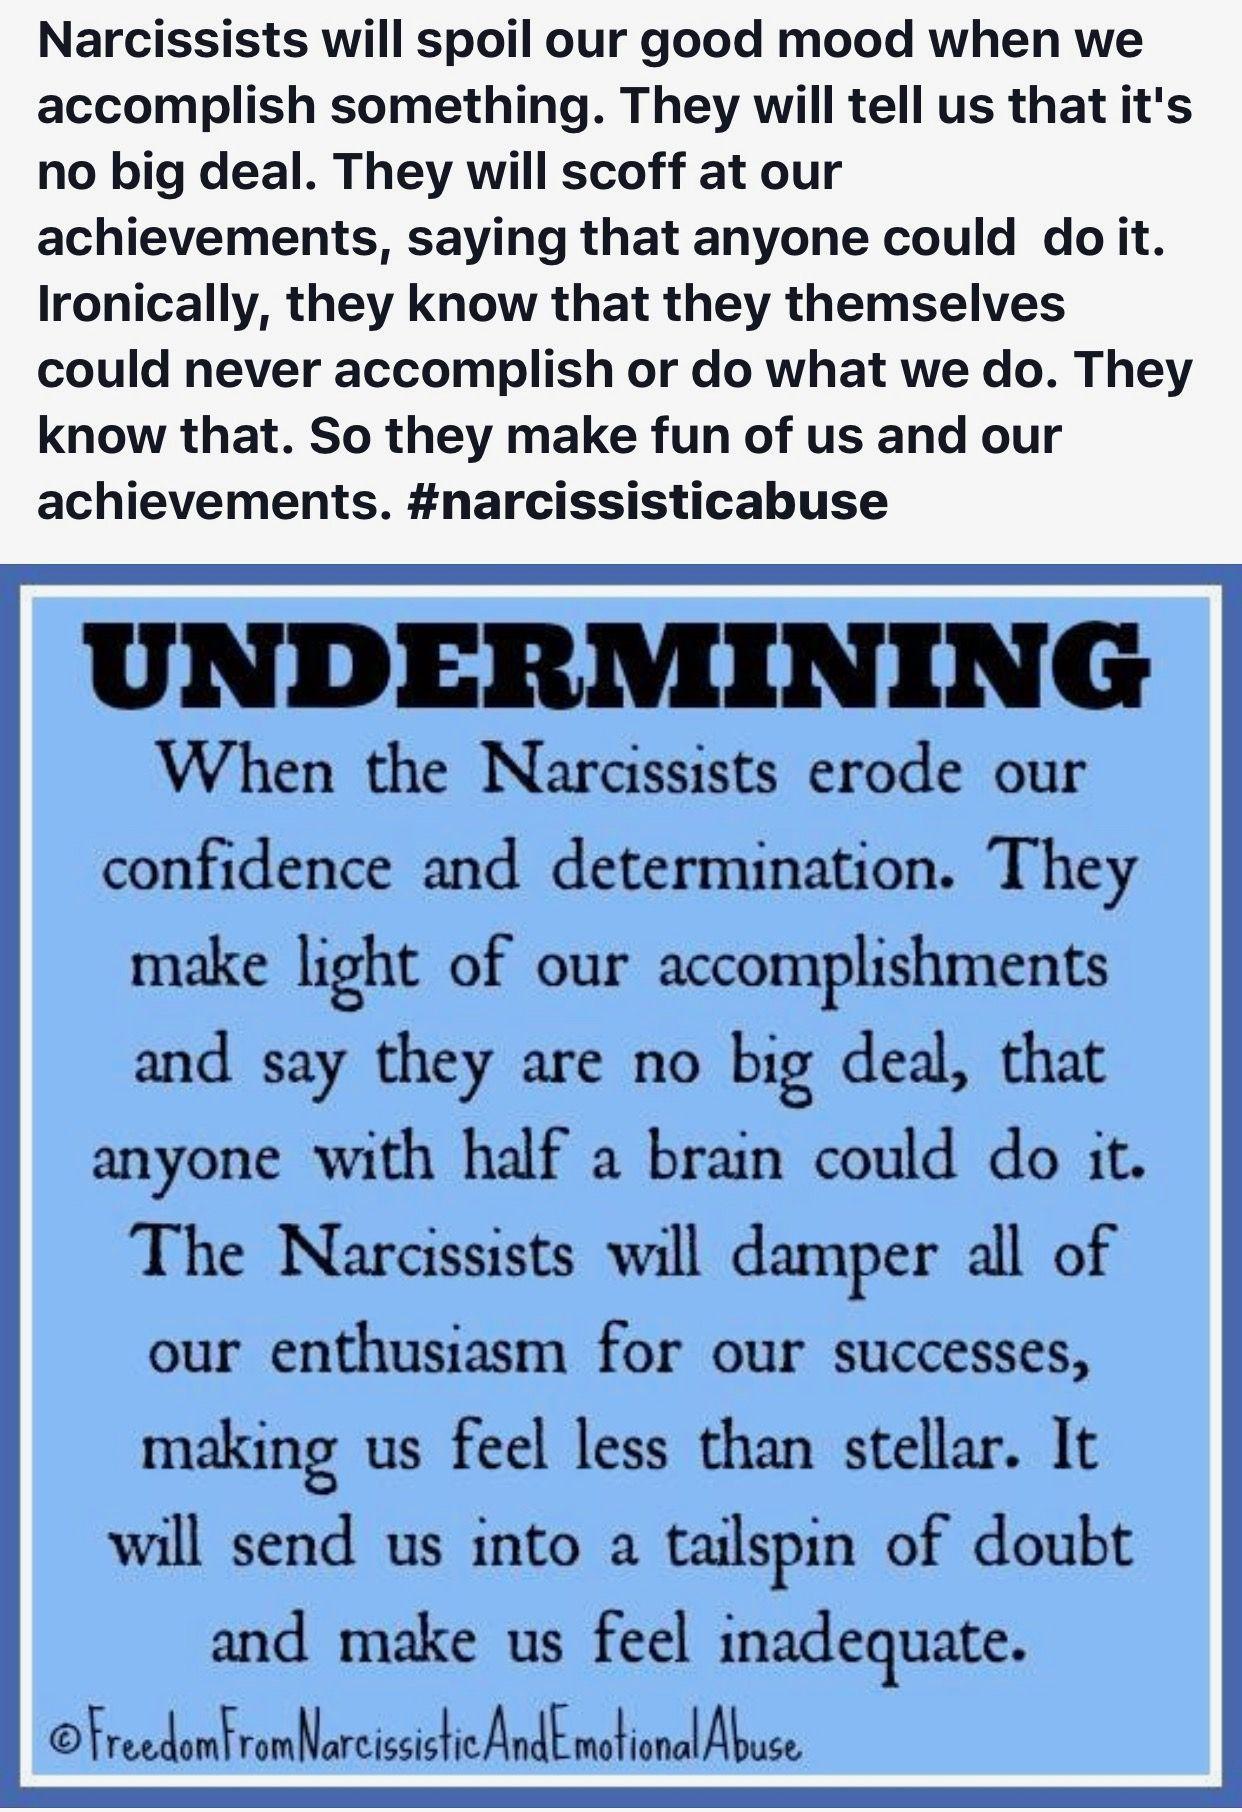 Narcissist psychopath